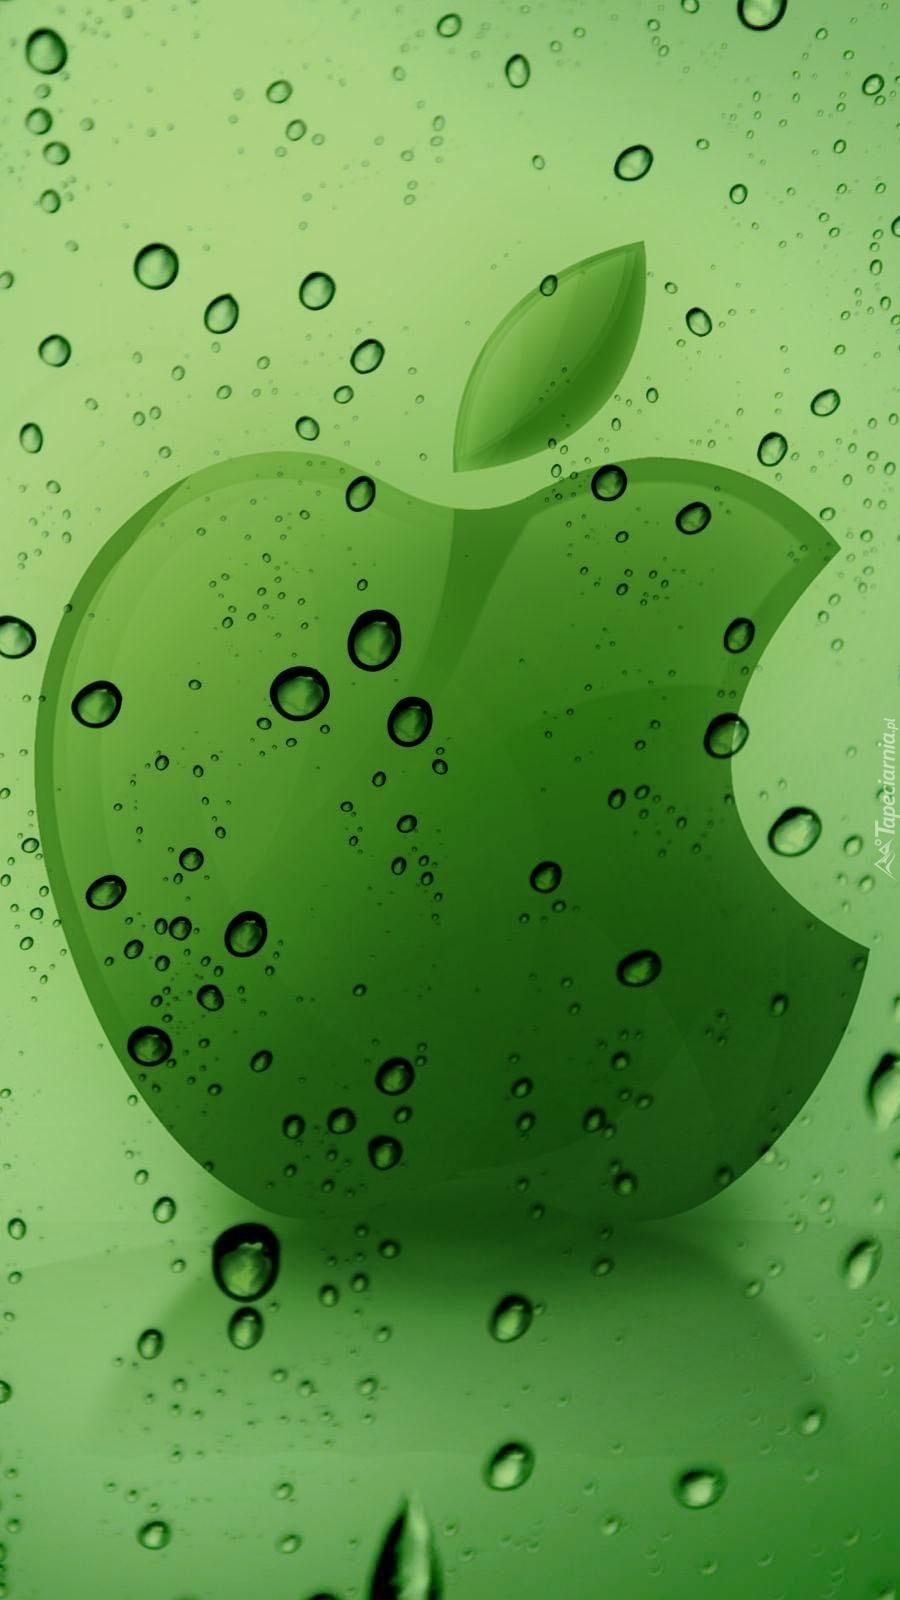 Zmoknięte Apple